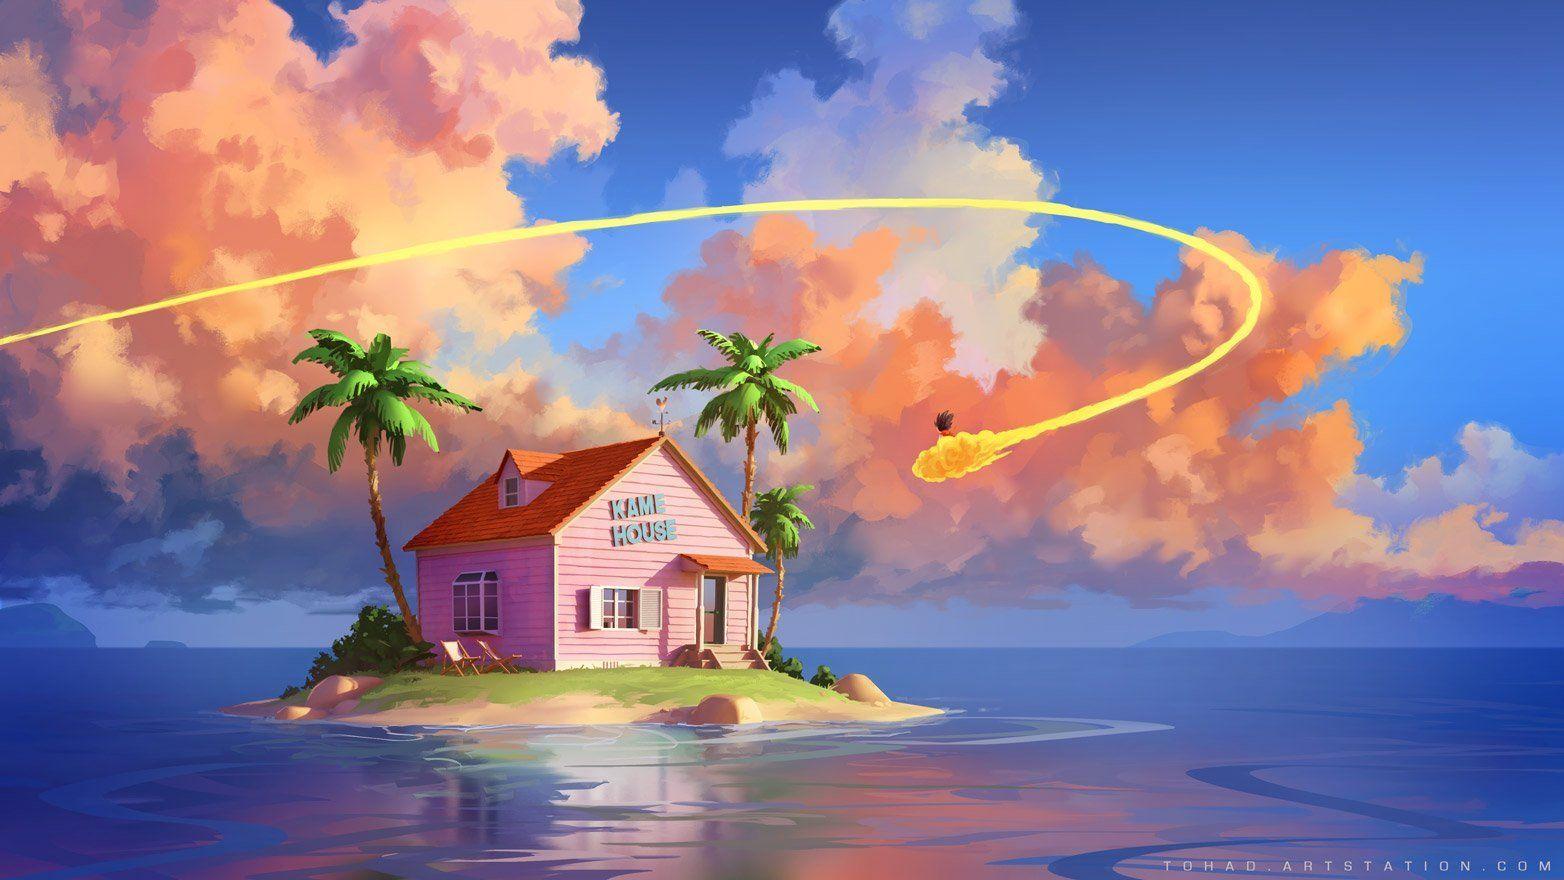 Dragon Ball Kame House By Sylvain Sarrailh Dbz Dragon Ball